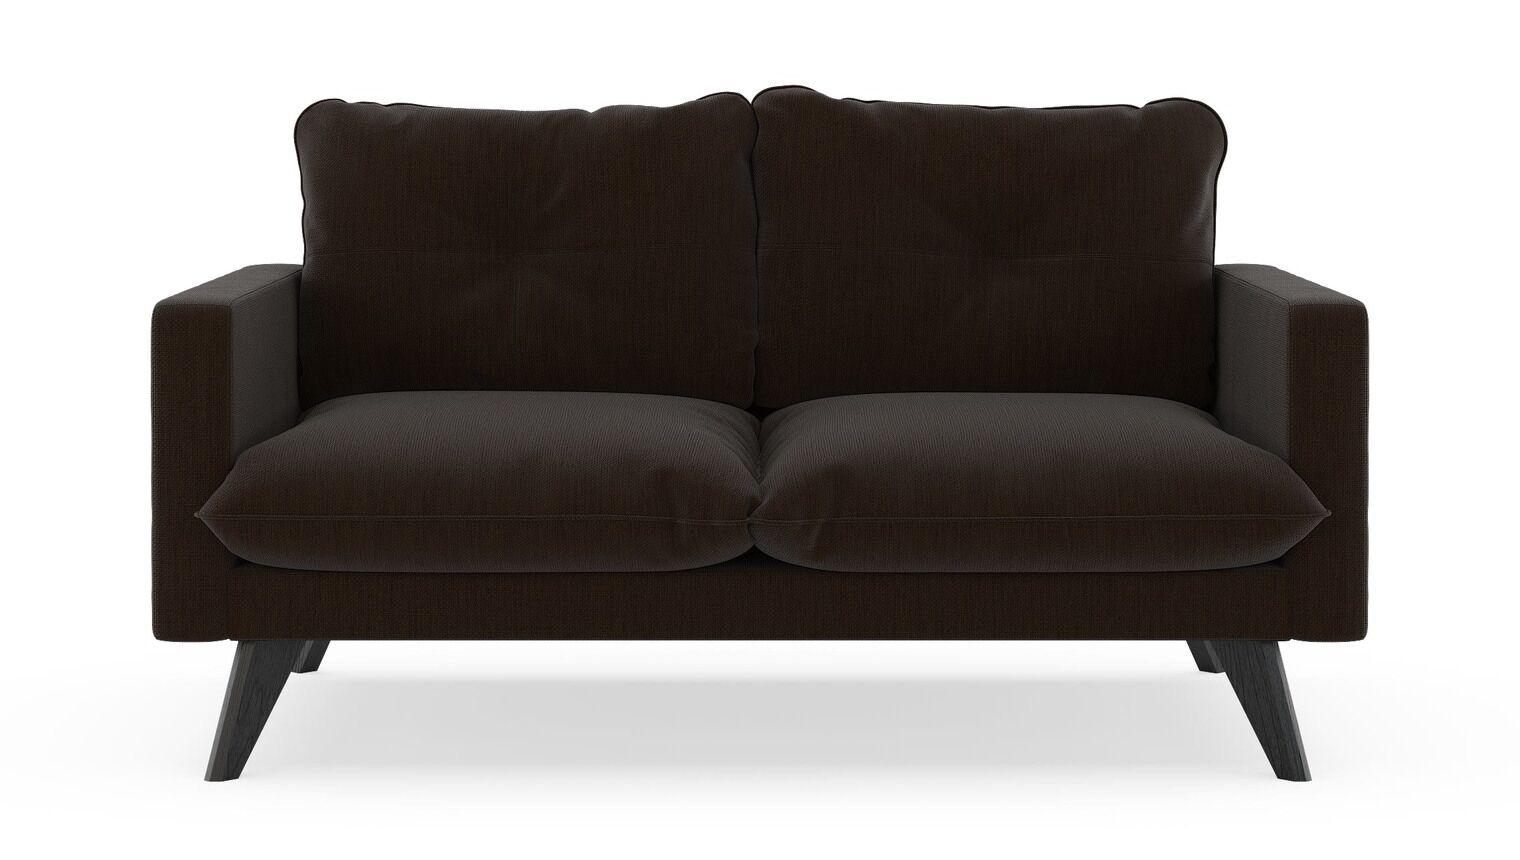 Crossman Loveseat Finish: Black, Upholstery: Wheat